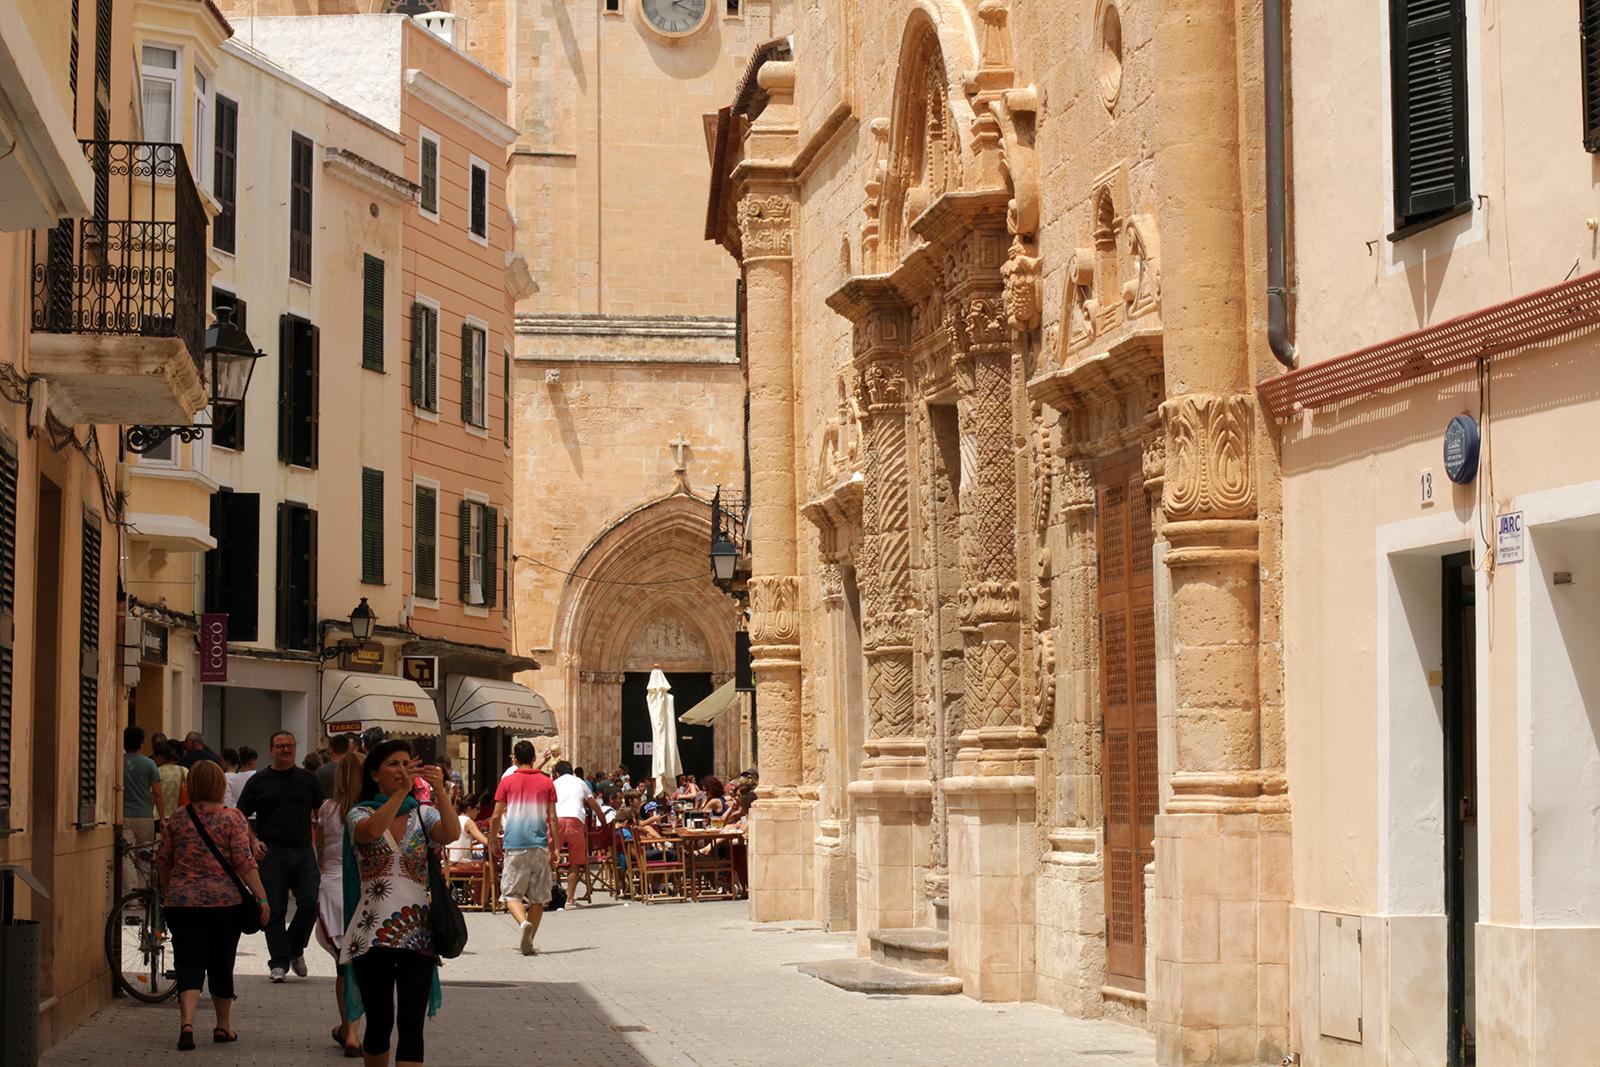 Ciutadella, Menorca, Spain, 2014